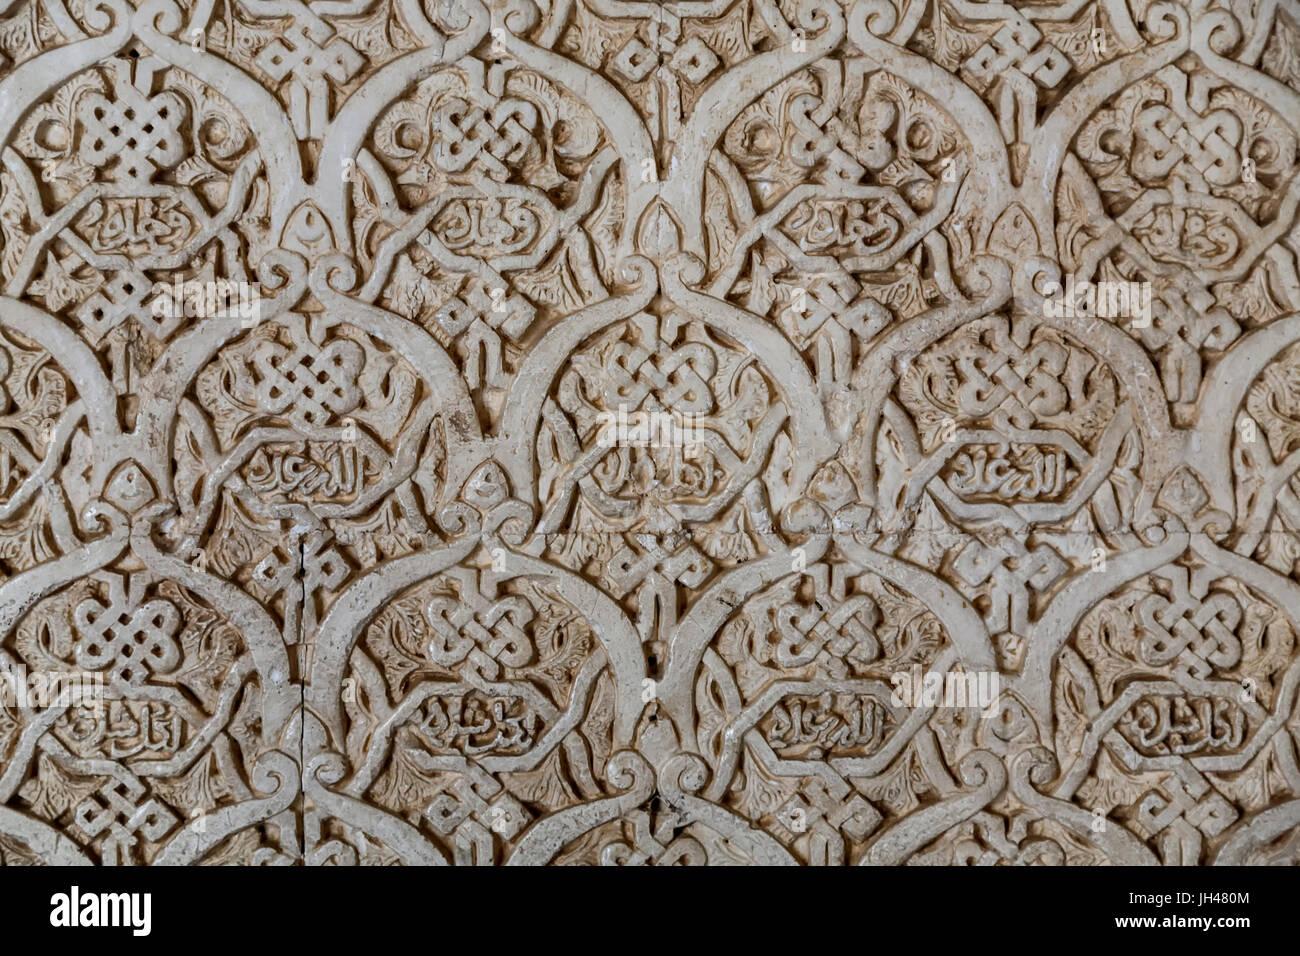 Wall detail, Nasrid Palaces, The Alhambra, Granada, Spain - Stock Image